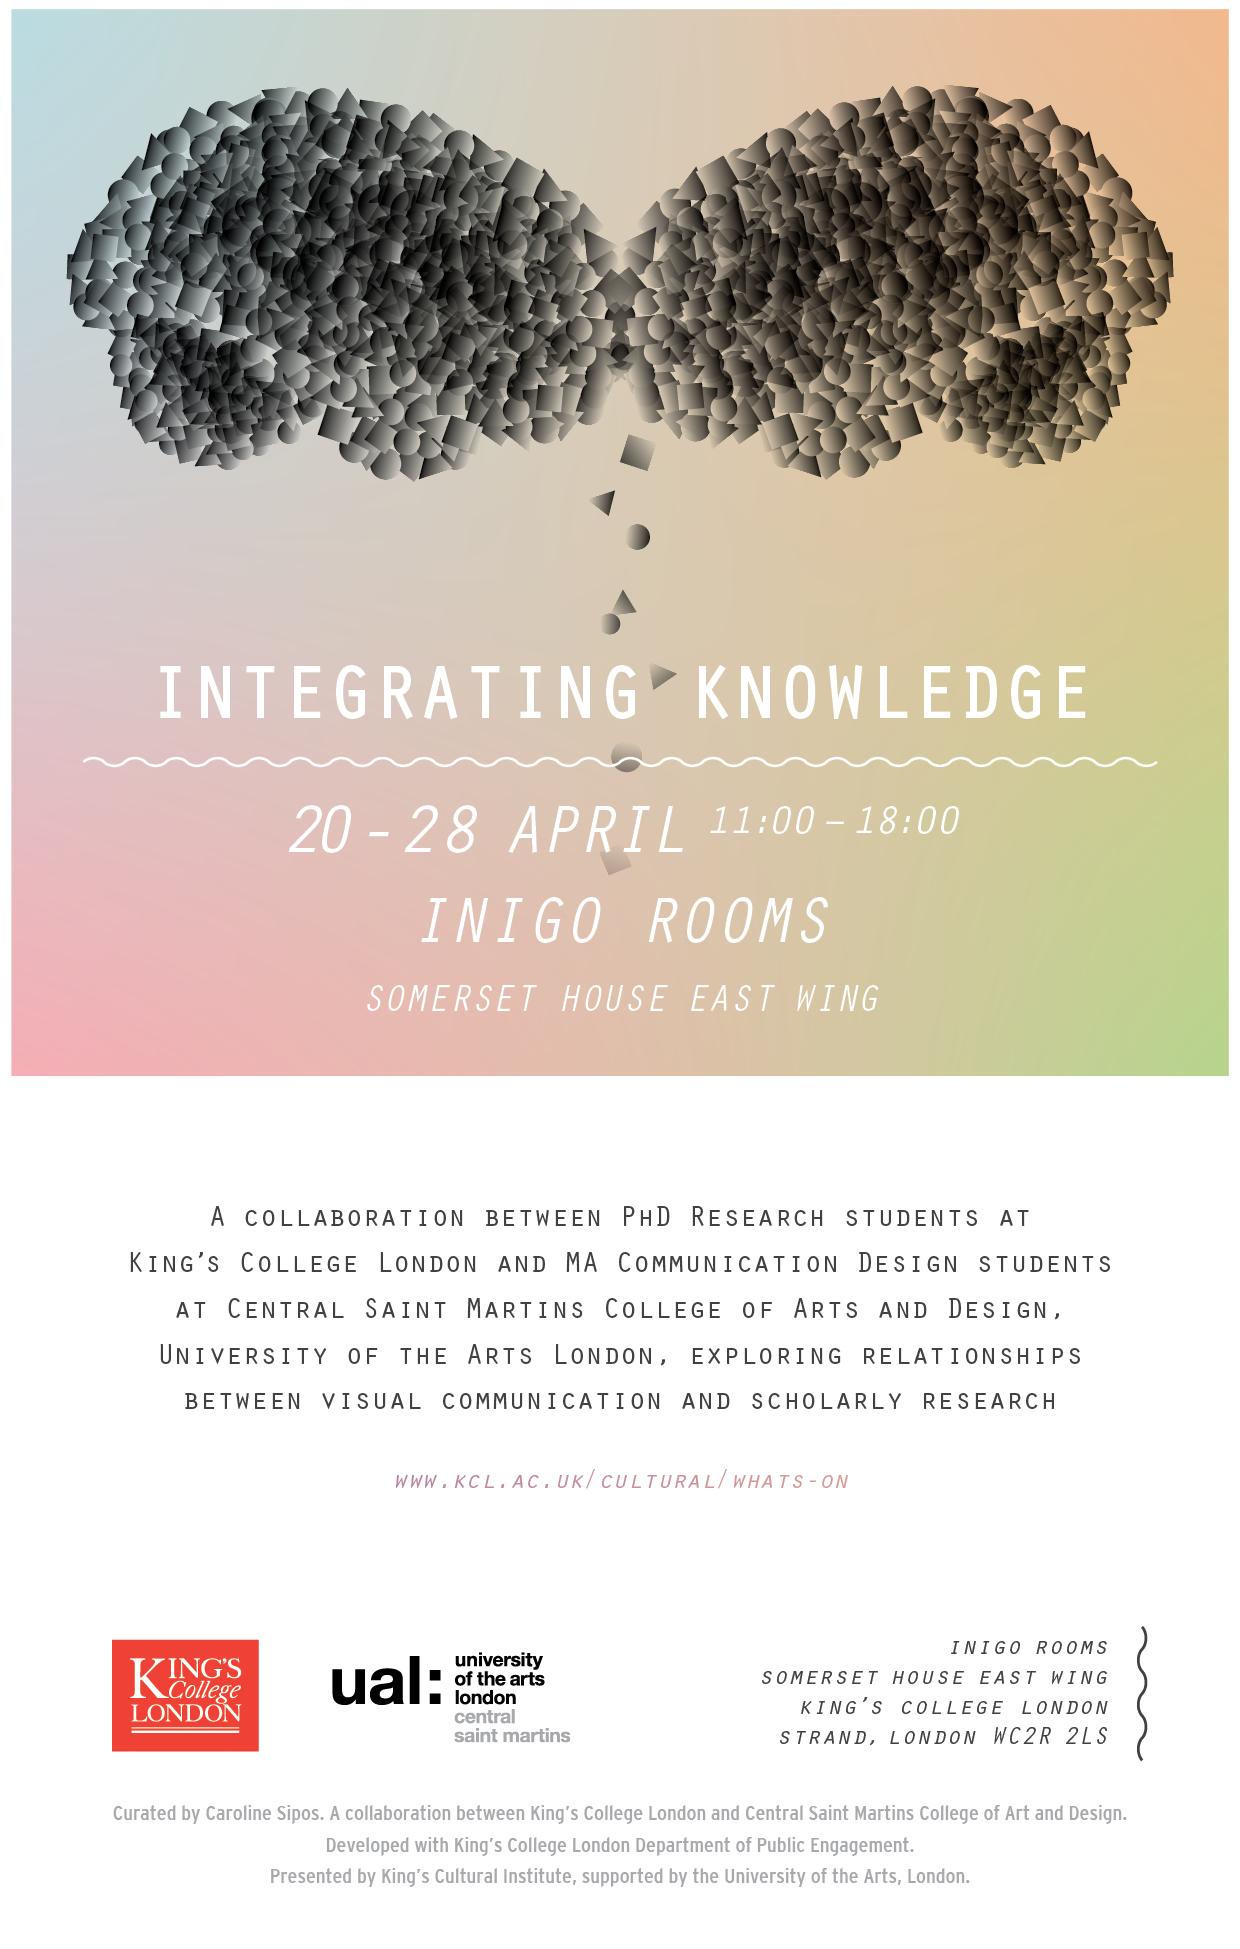 'Integrating Knowledge' invite